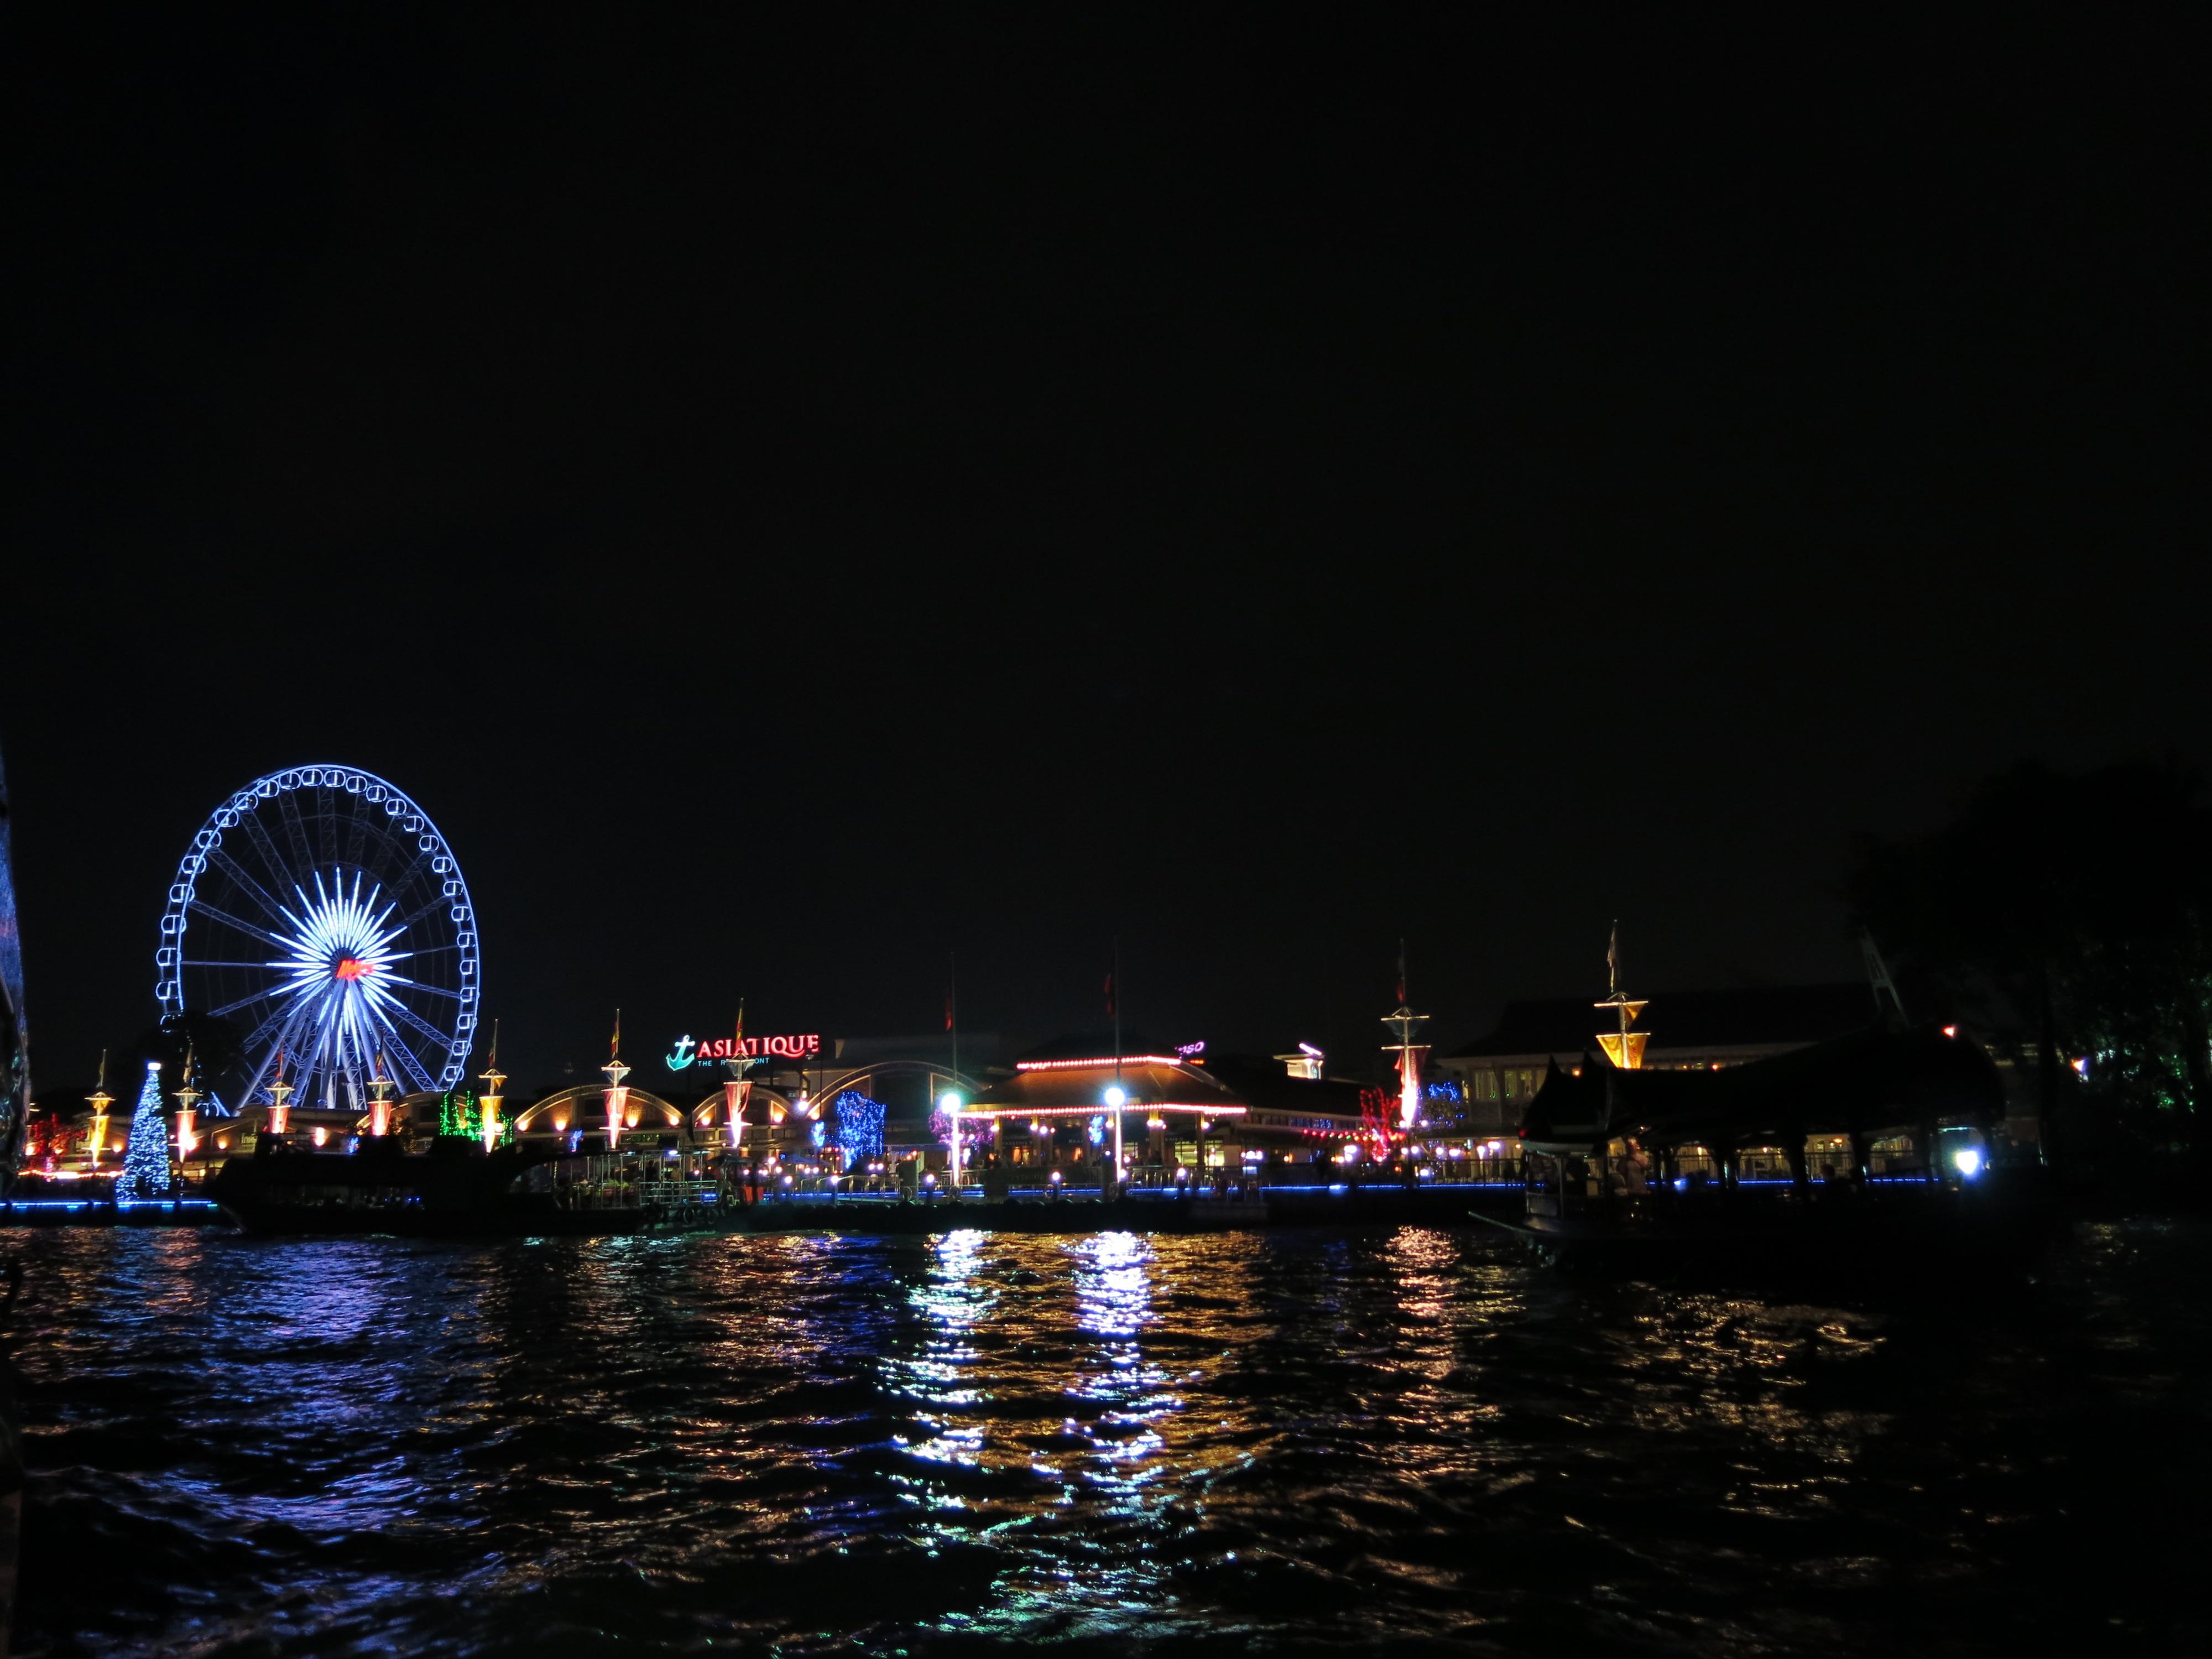 Bangkok day 1: Asiatique Night Market